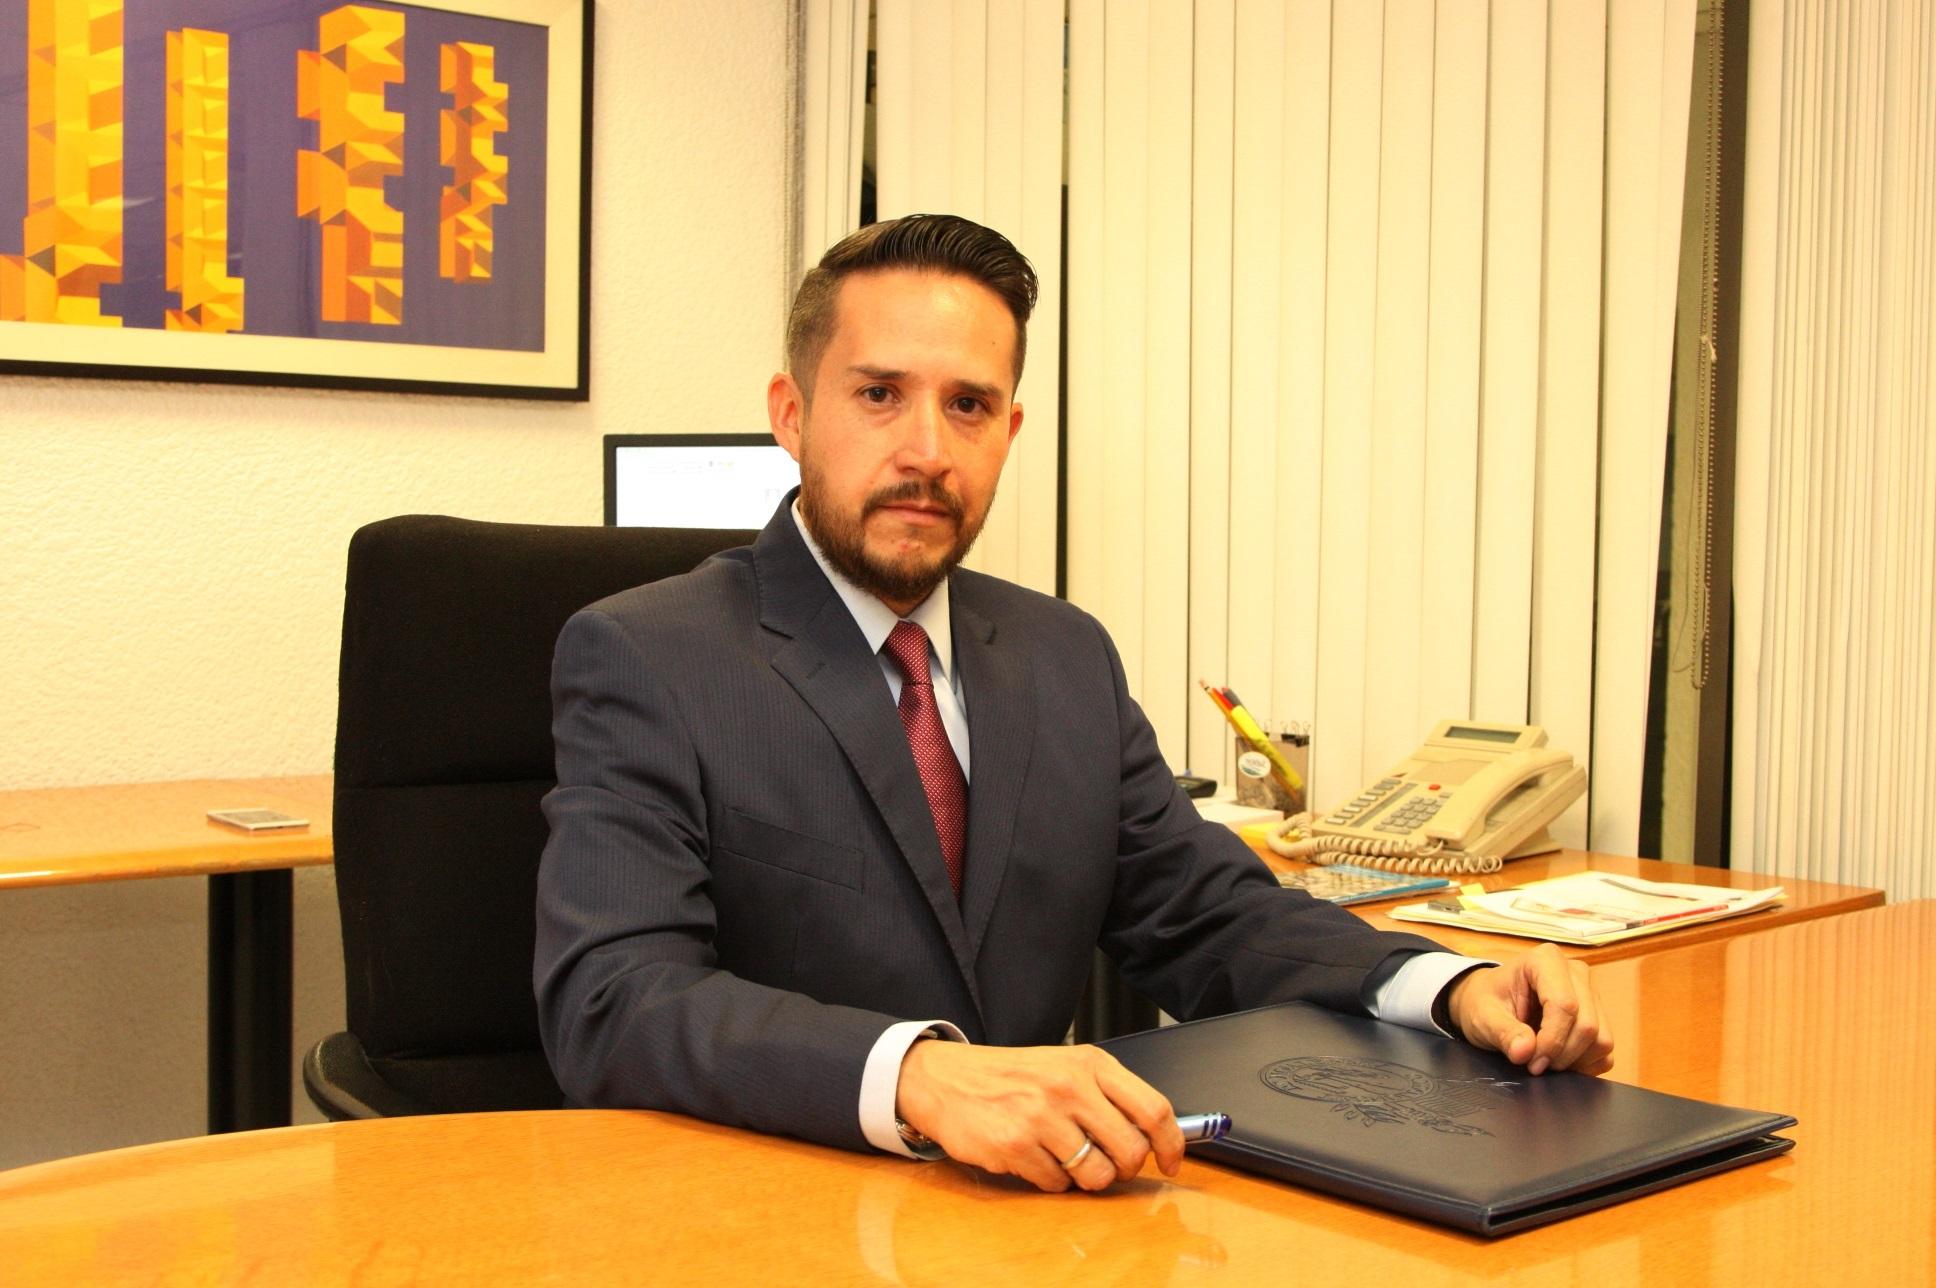 Elesban Jaime Solano Amador. Director de Recursos Humanos